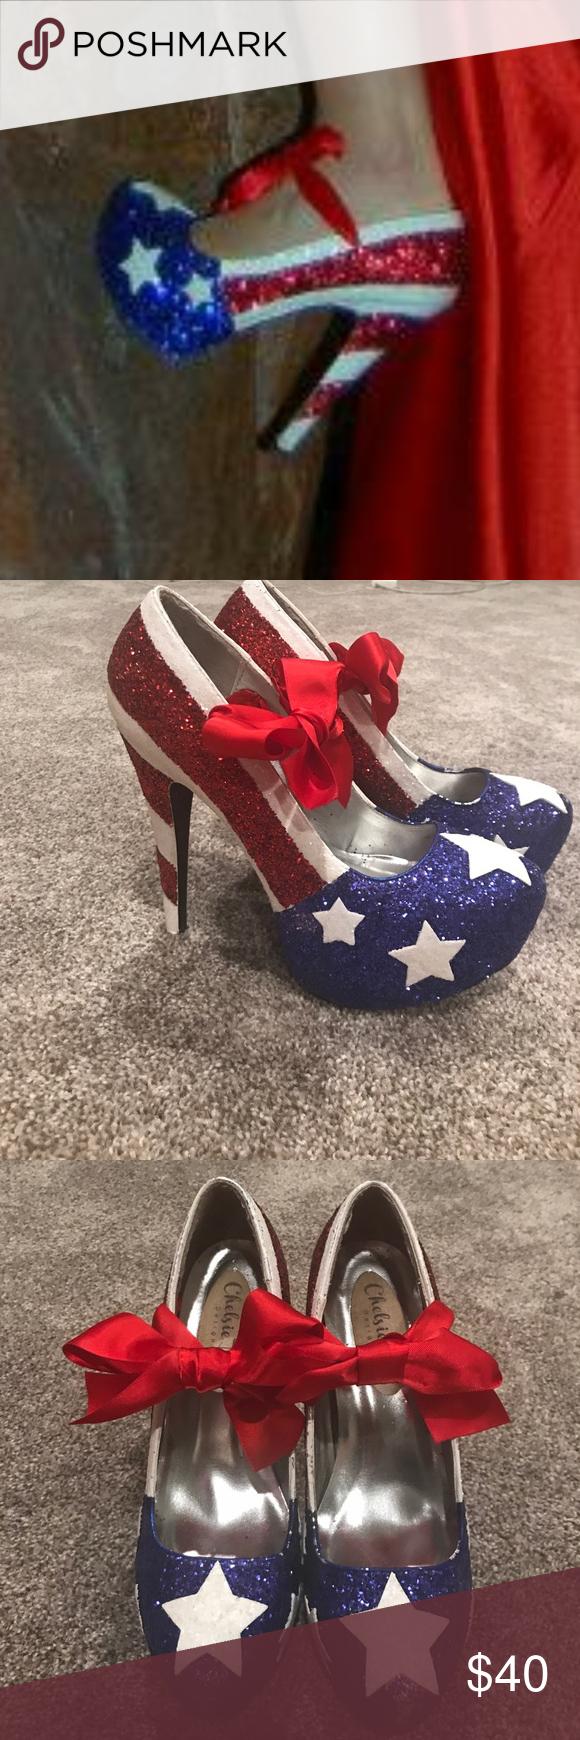 ADORABLE Sequined American Flag Heels Beautiful handmade American